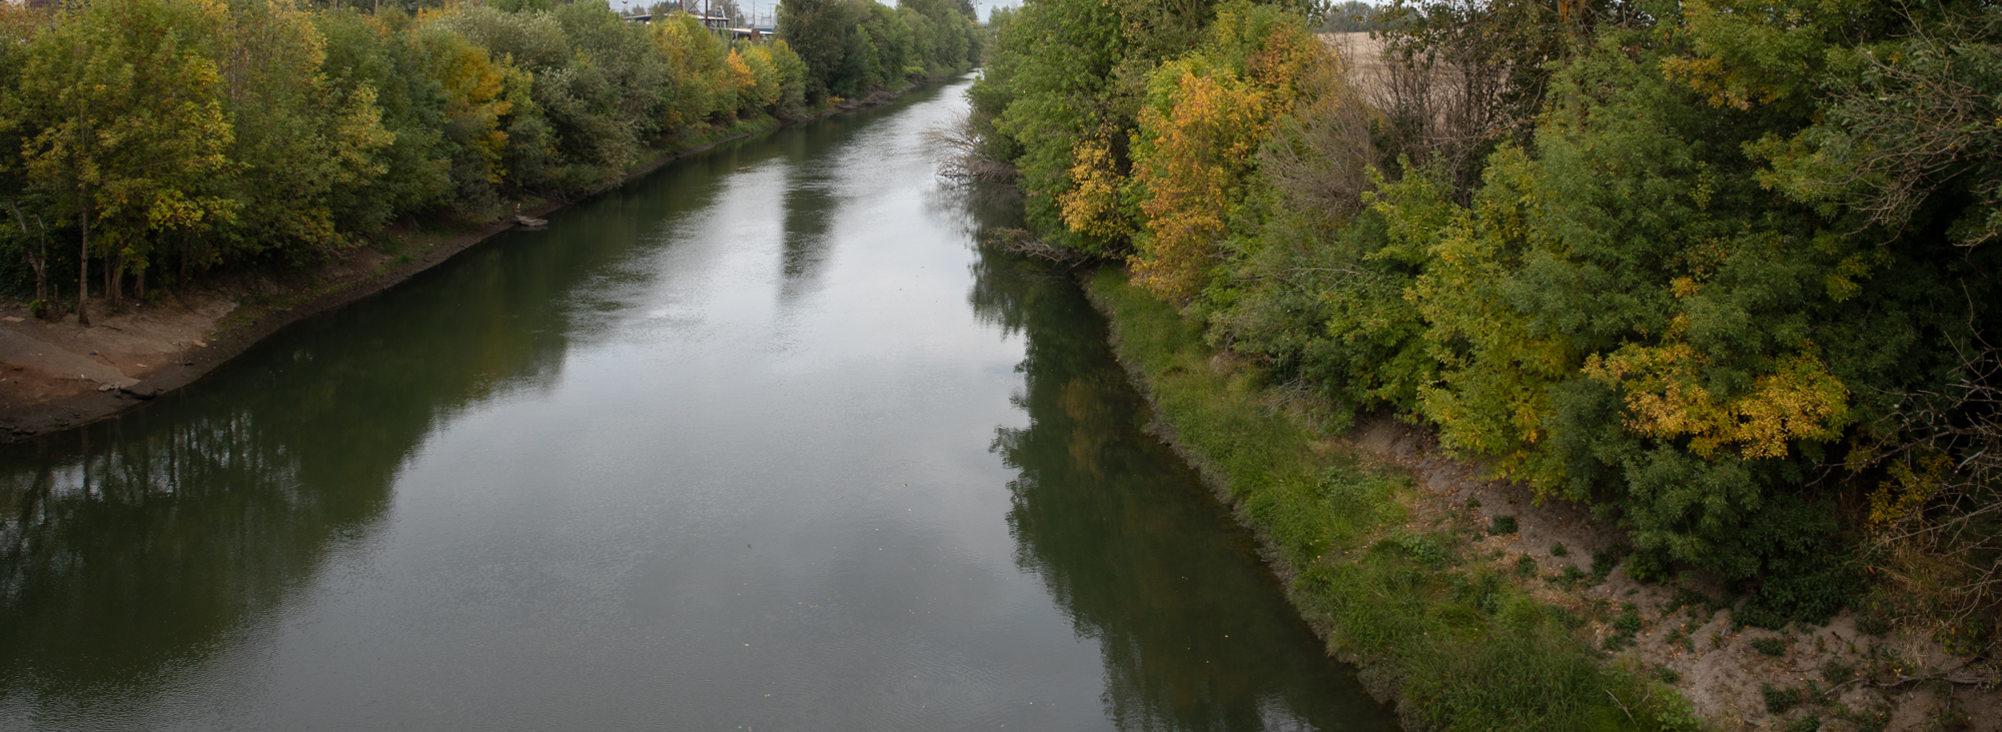 the Columbia Slough along St. Johns Prairie